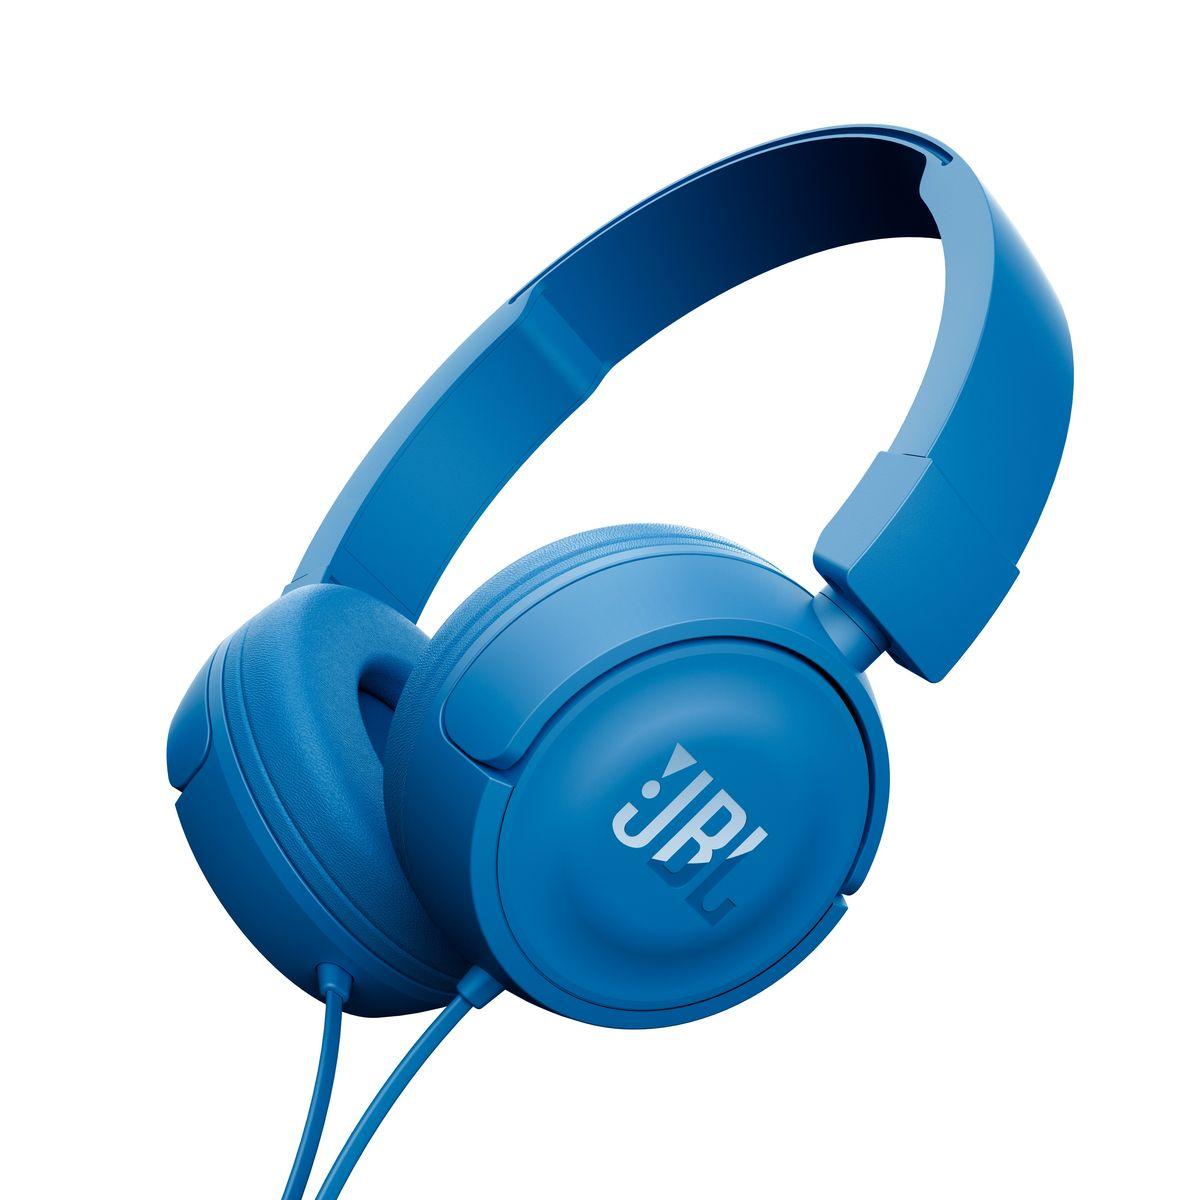 T450 - Bleu - Casque audio